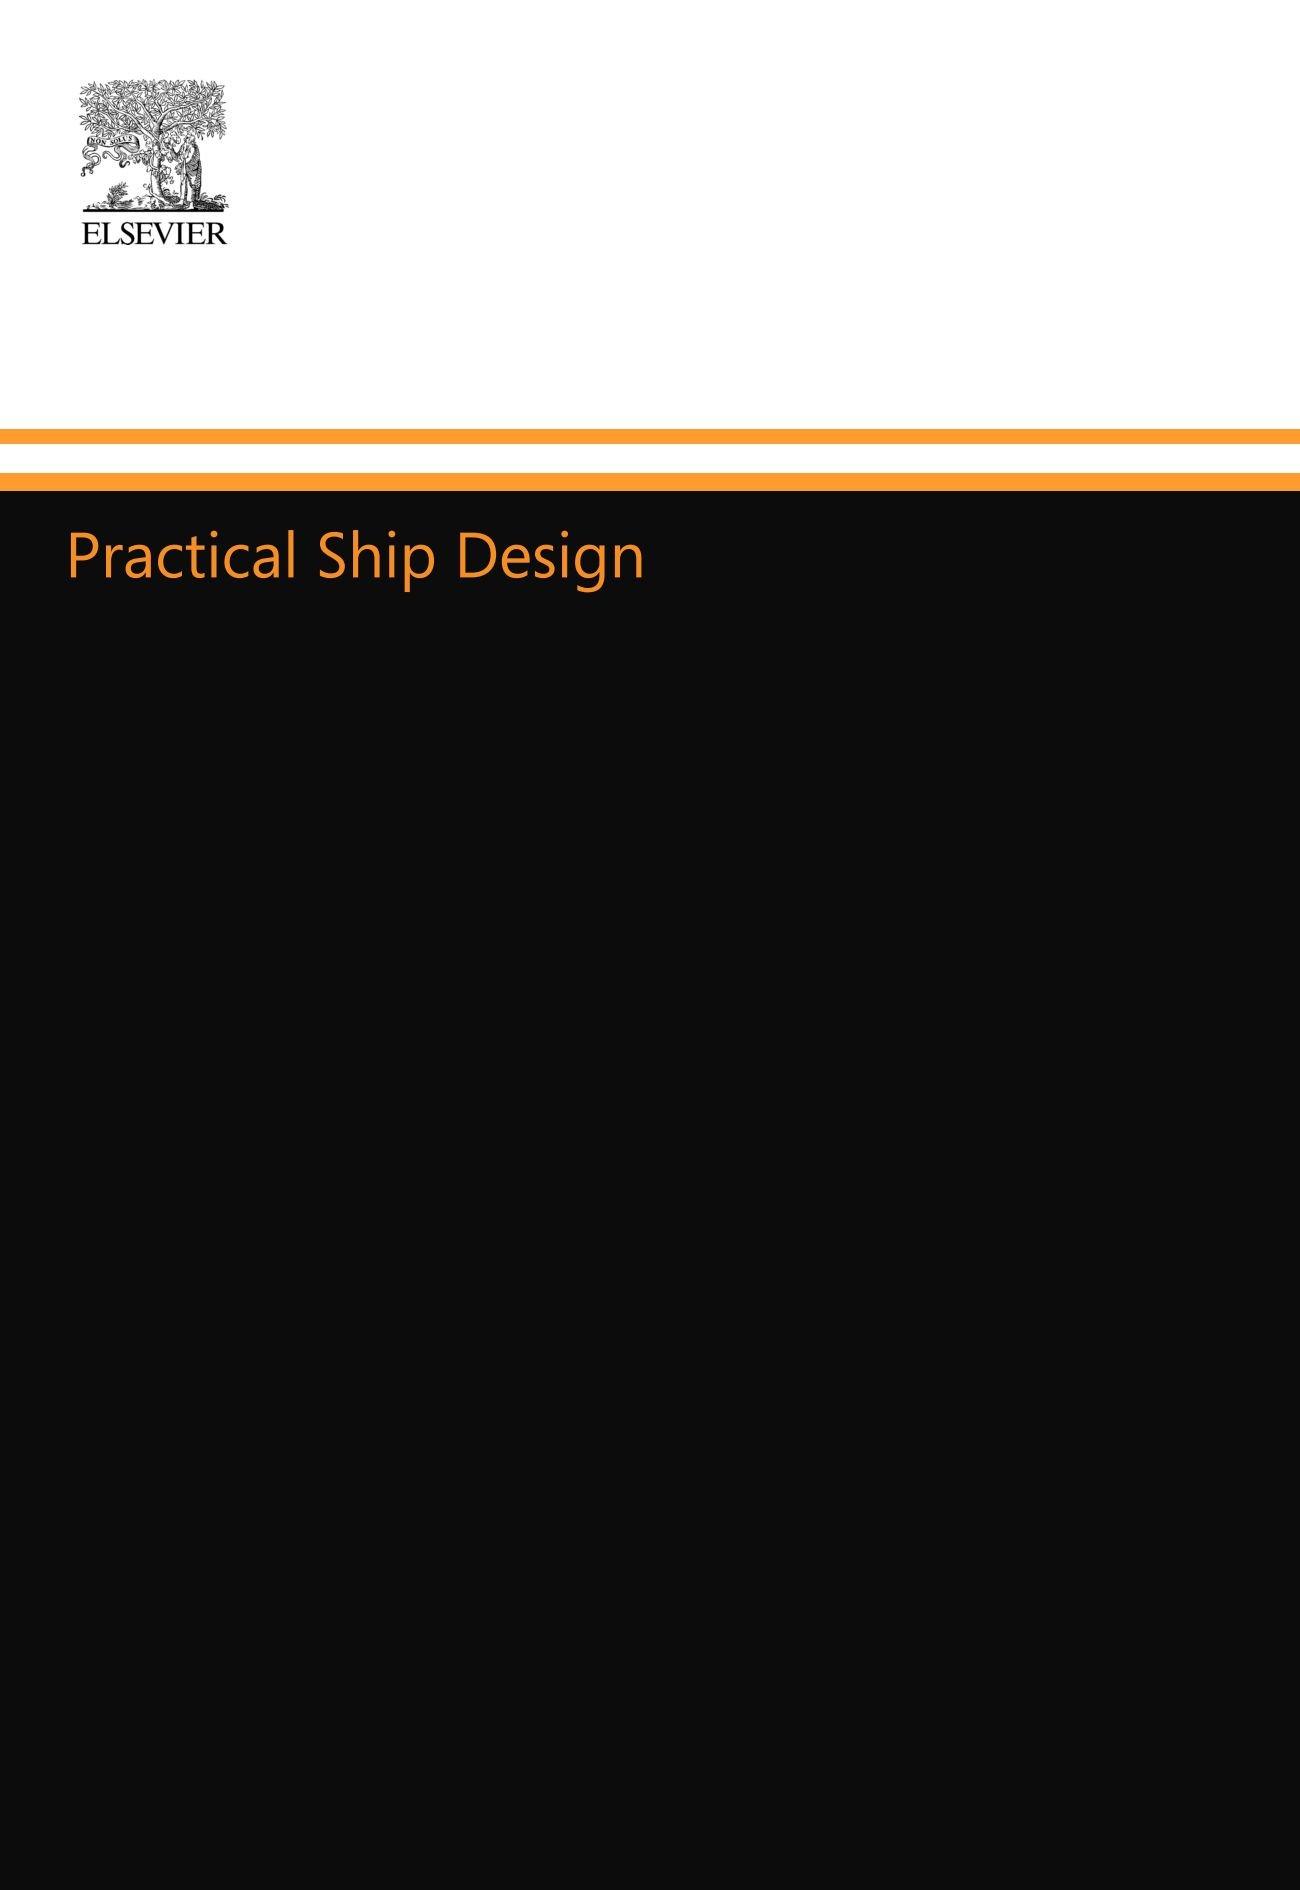 Practical Ship Design: Volume 1 (Elsevier Ocean Engineering Series):  Amazon.co.uk: David G. M. Watson: 9780080440545: Books